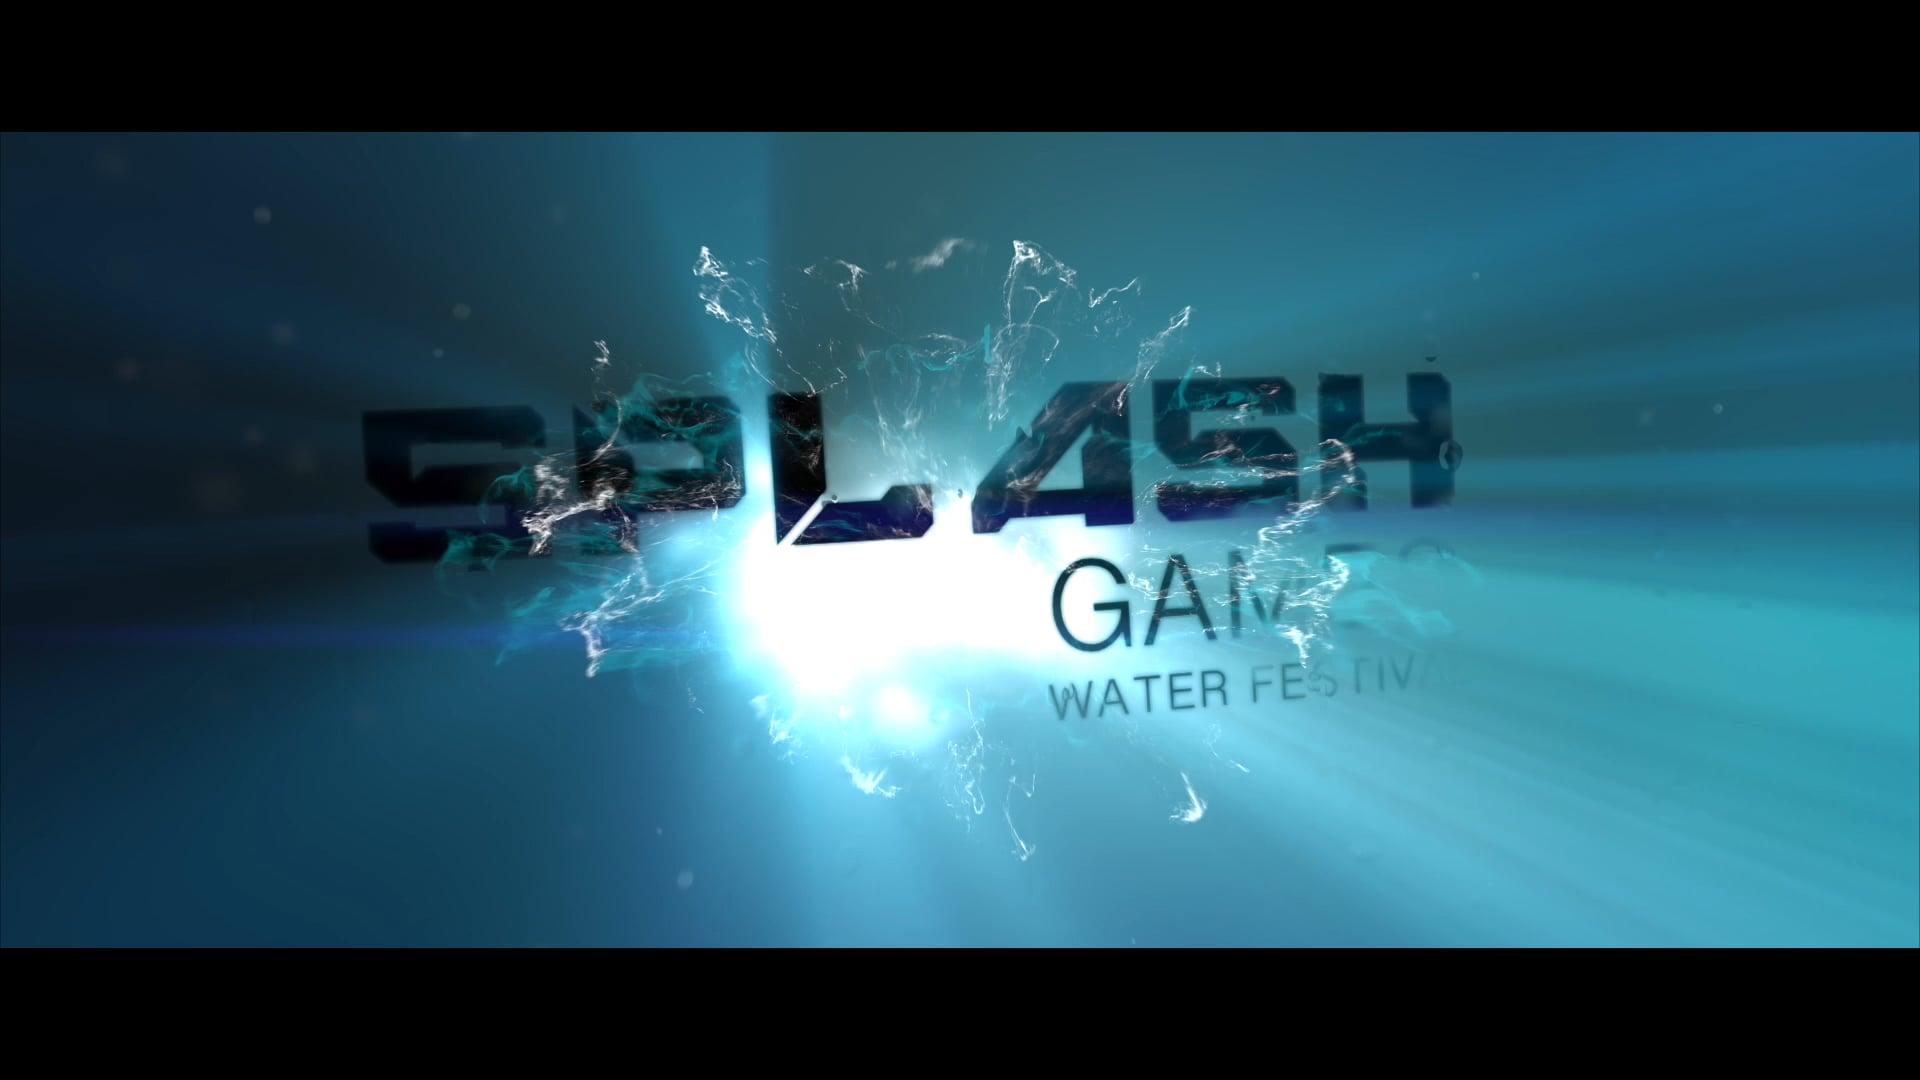 Splashgames Water Festival